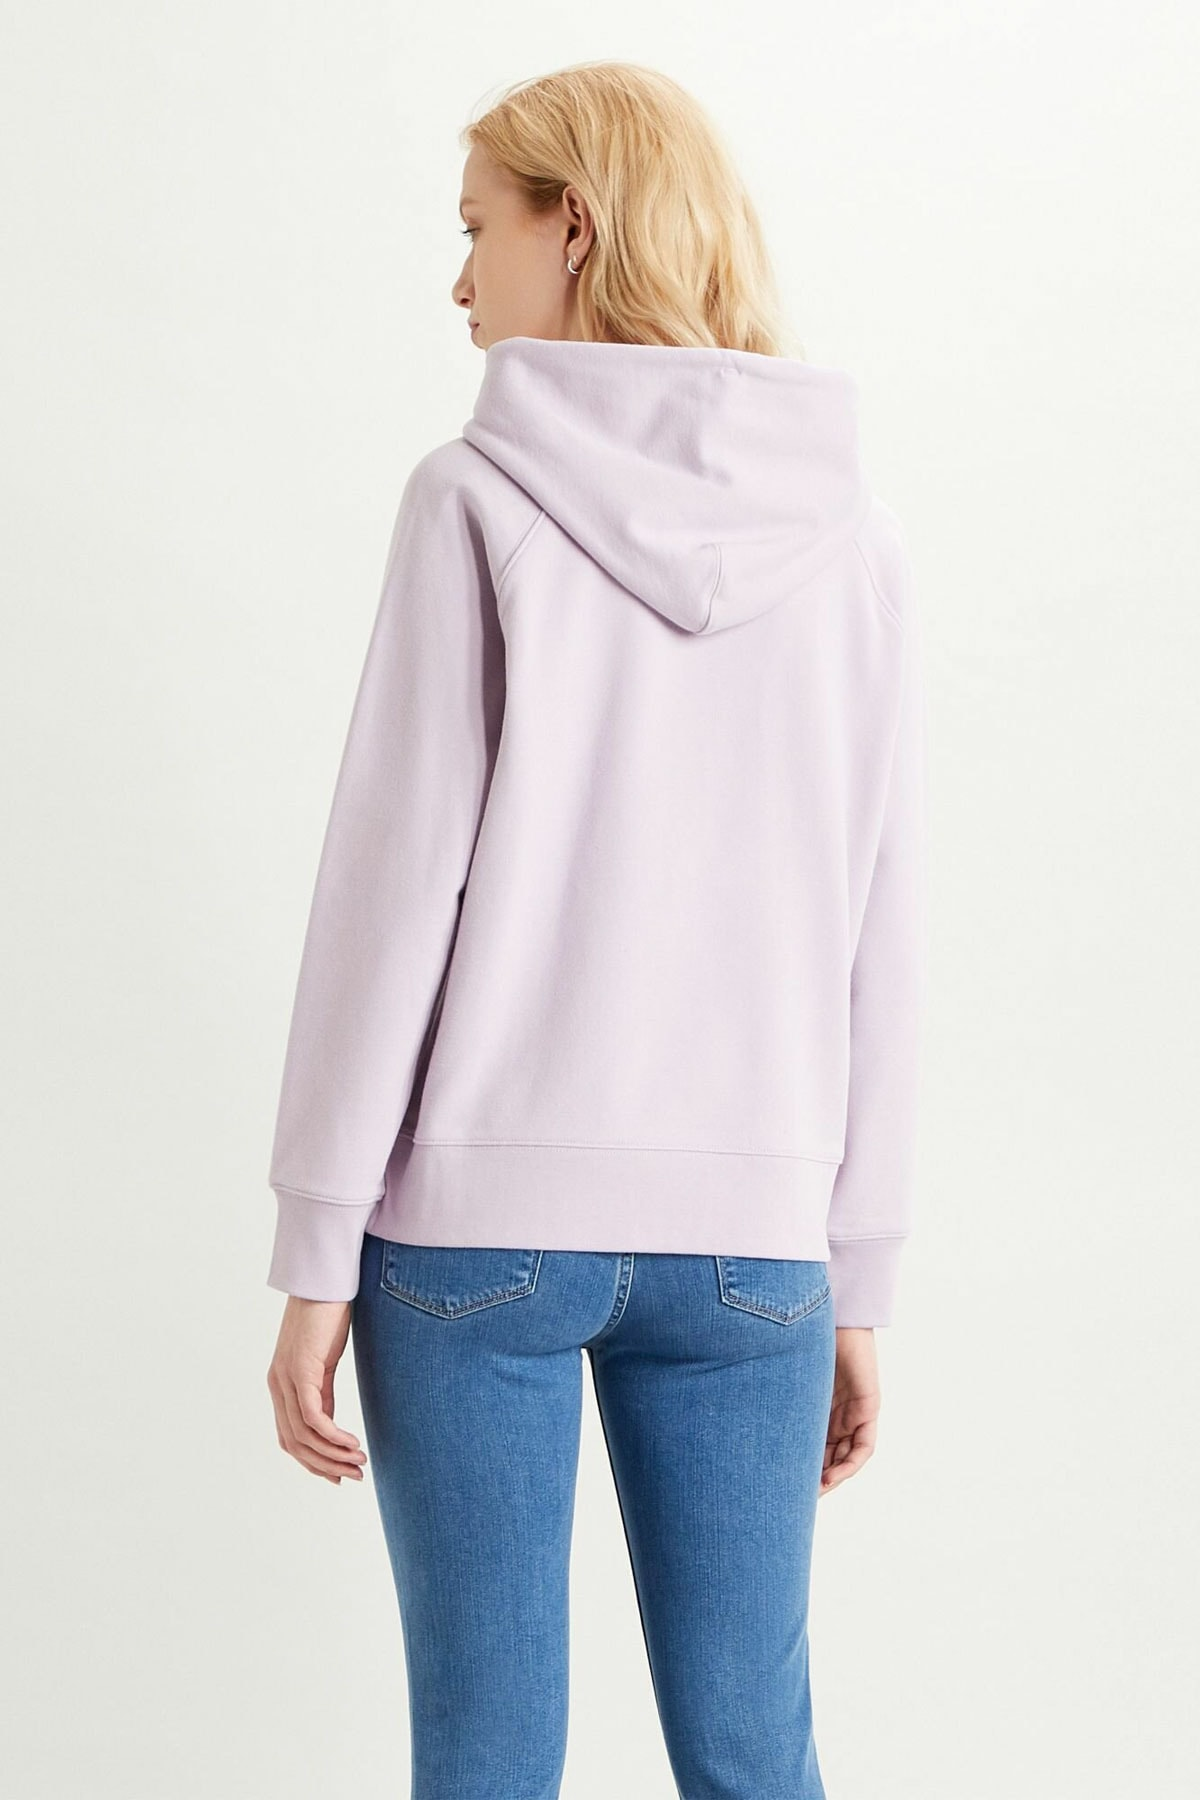 Levi's Kadın Graphic Sport Hoodie Sweatshirt 35946-0206 2